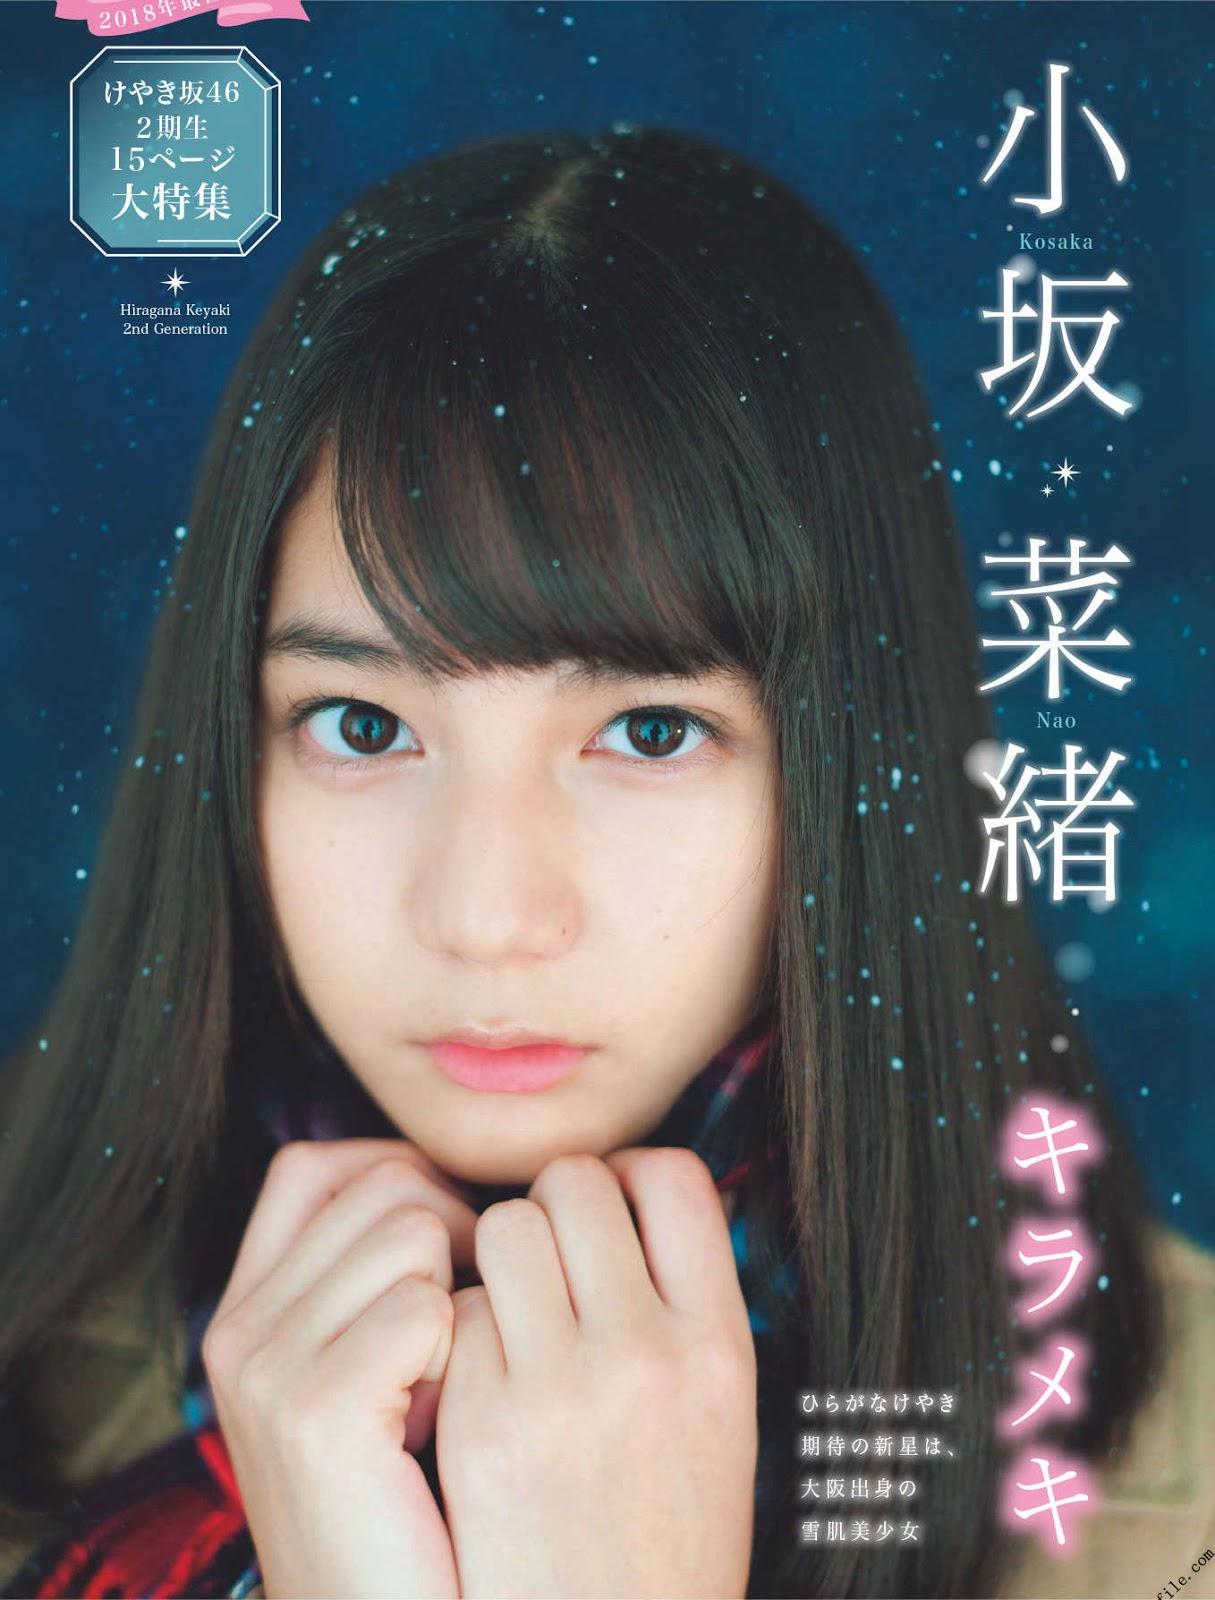 Kosaka Nao 小坂菜緒, FLASHスペシャルグラビアBEST 2018新春号